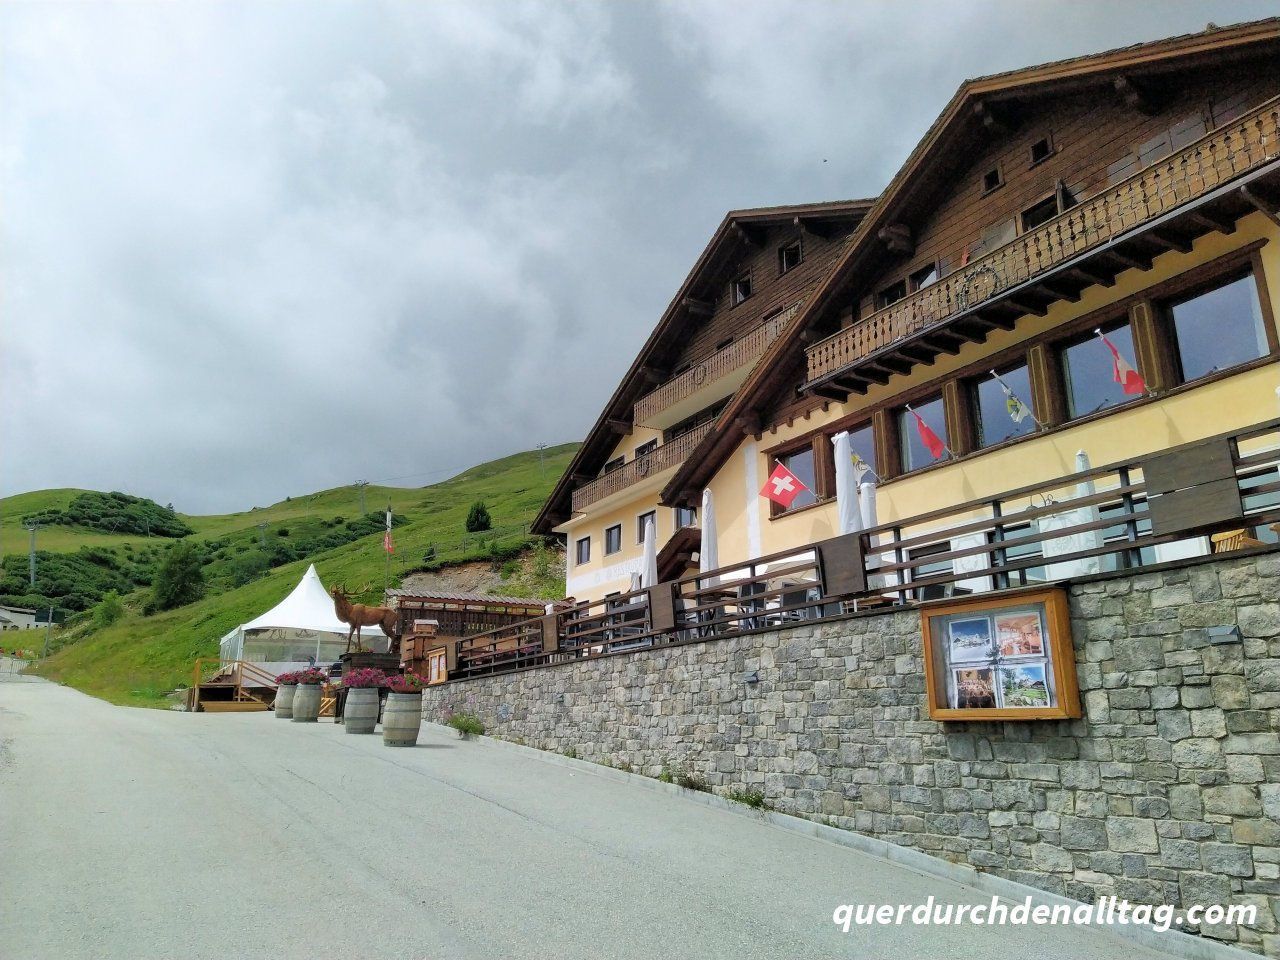 Salastrains St. Moritz